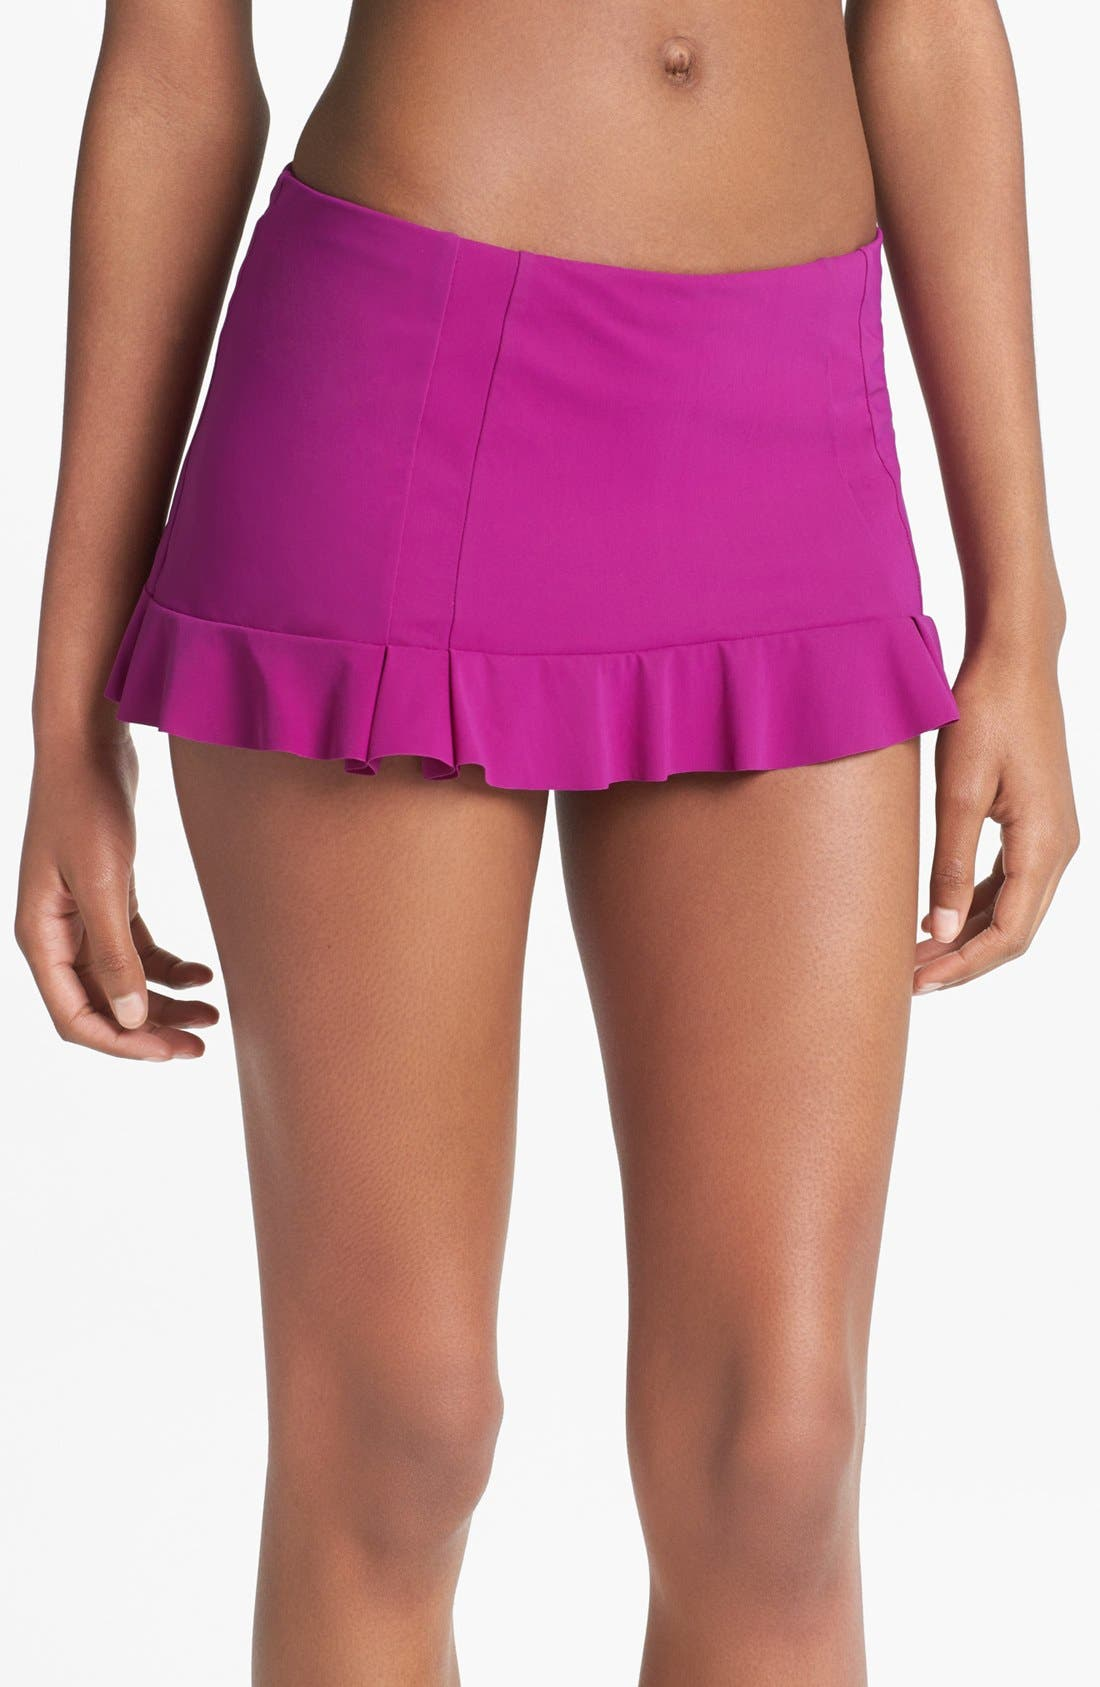 Alternate Image 1 Selected - Profile by Gottex 'Starlet' Skirted Bikini Bottoms